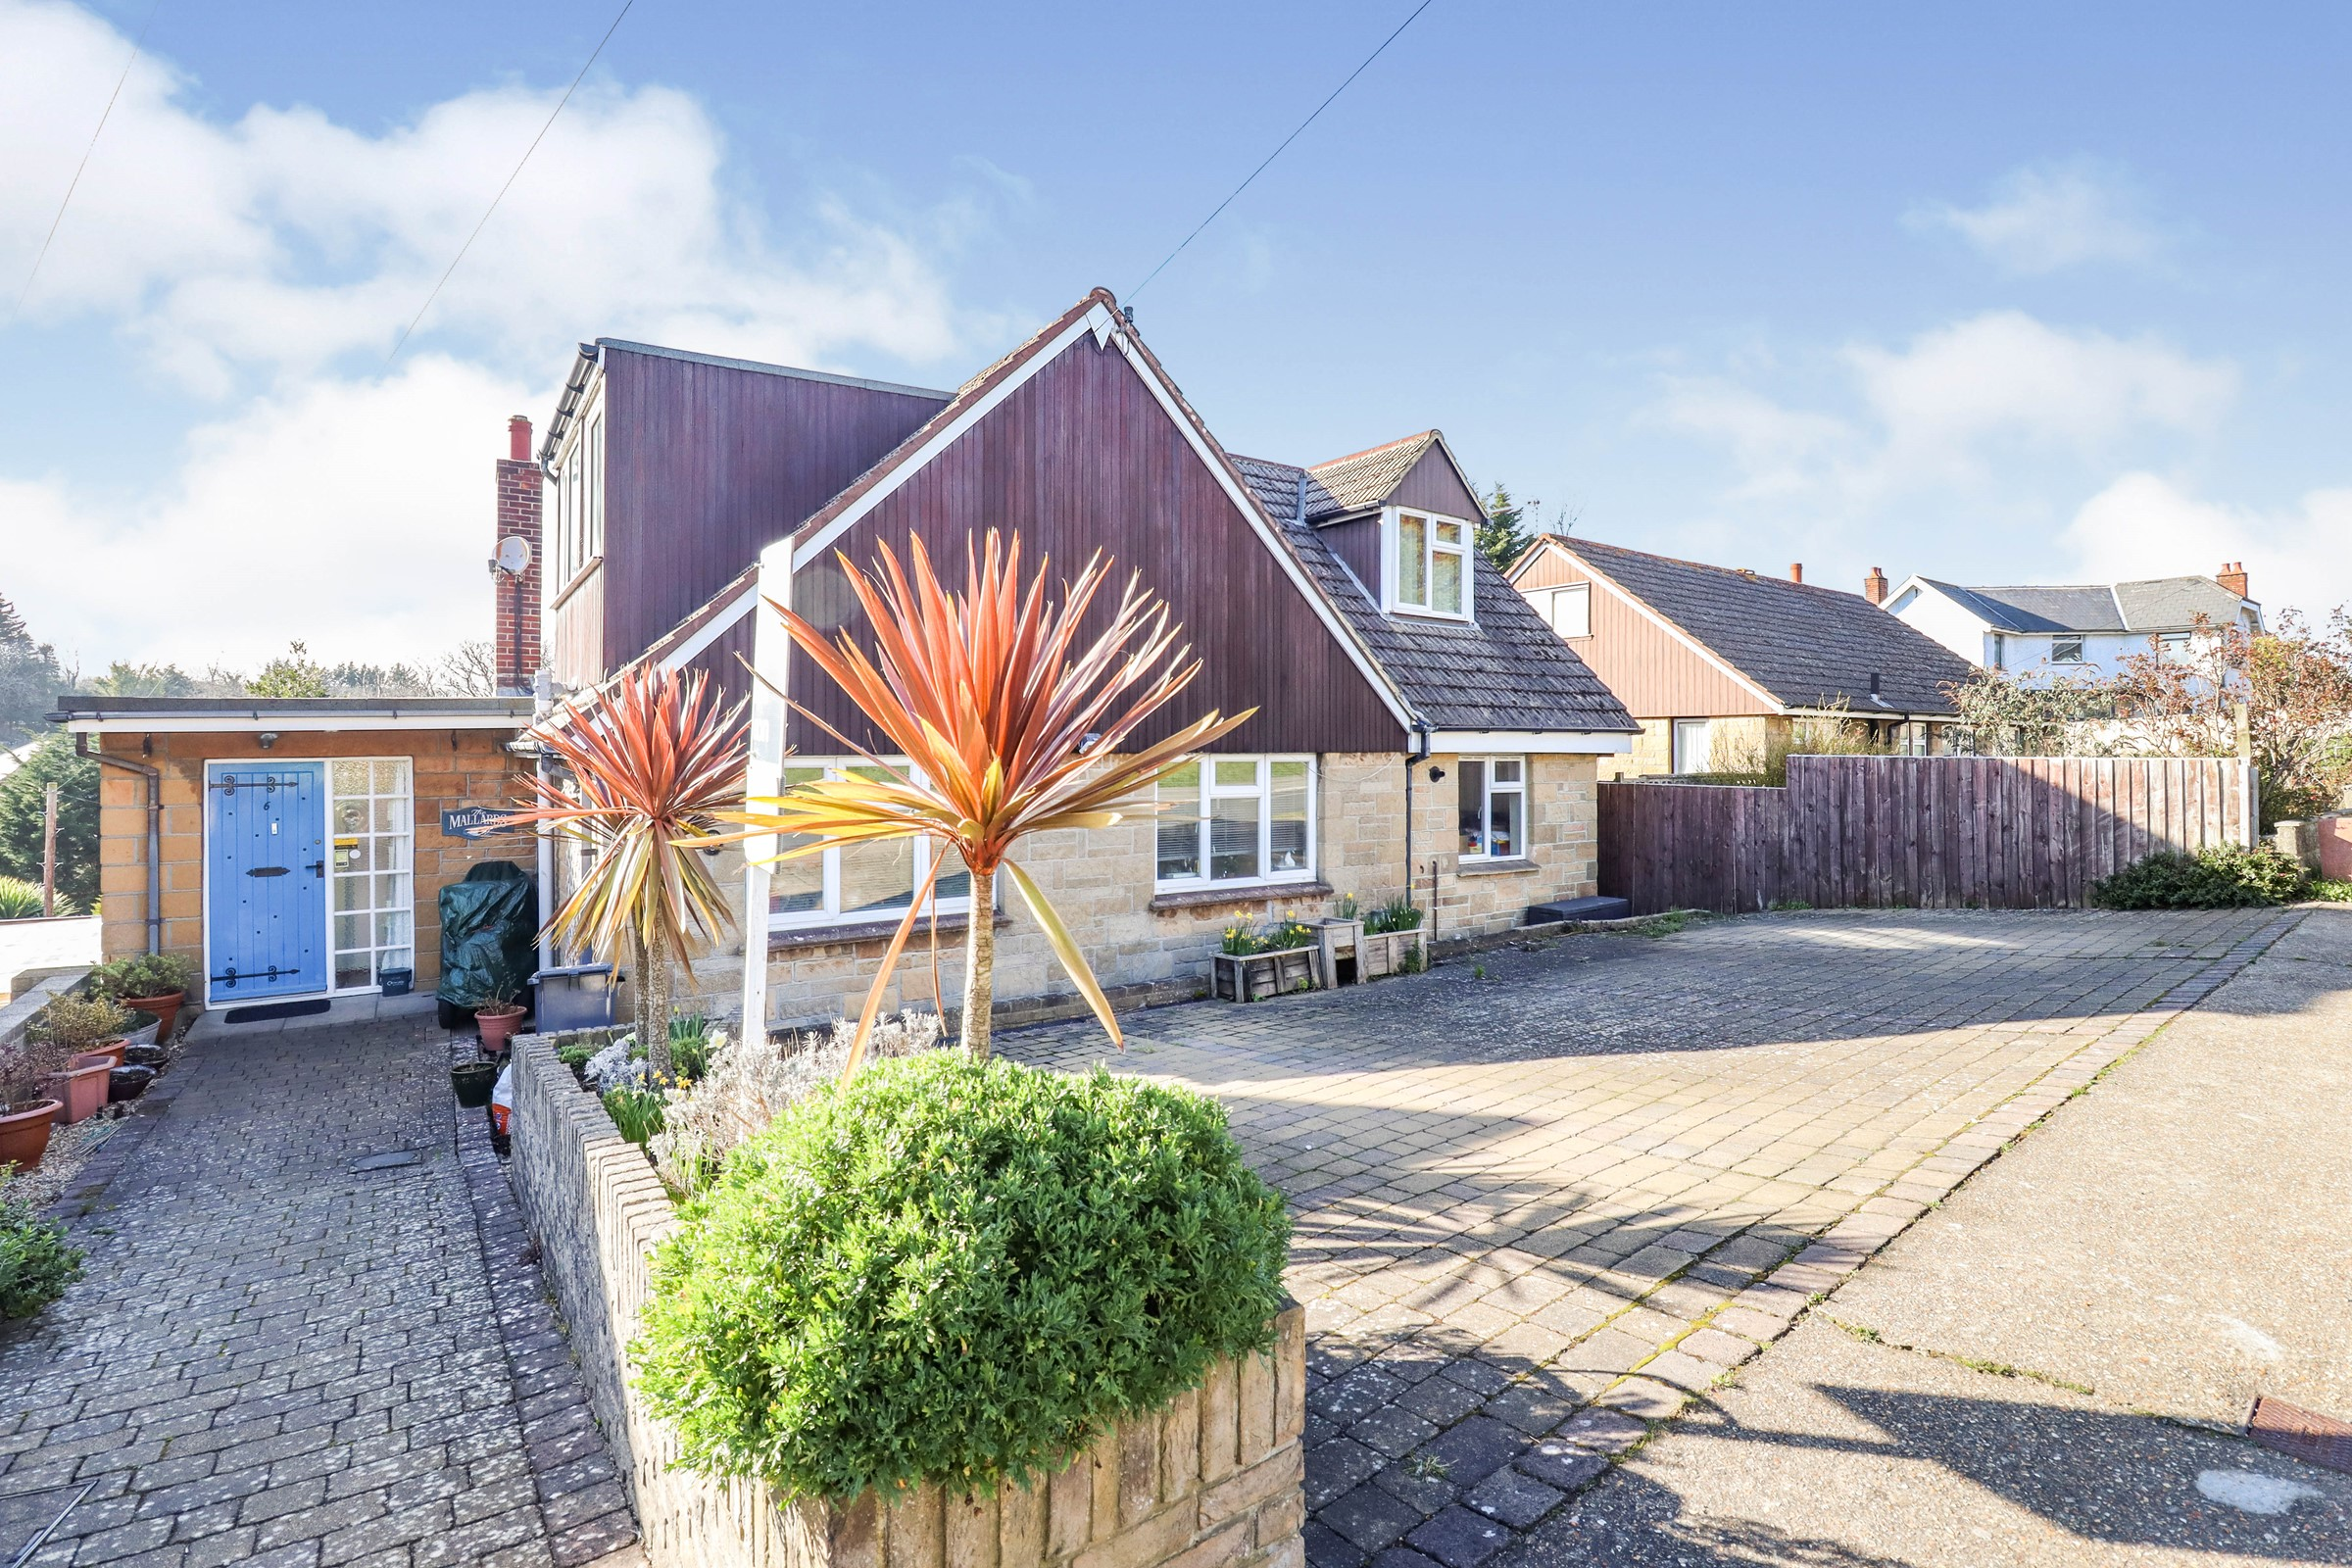 Landguard Manor Rd, Shanklin, Isle Of Wight, ., PO37